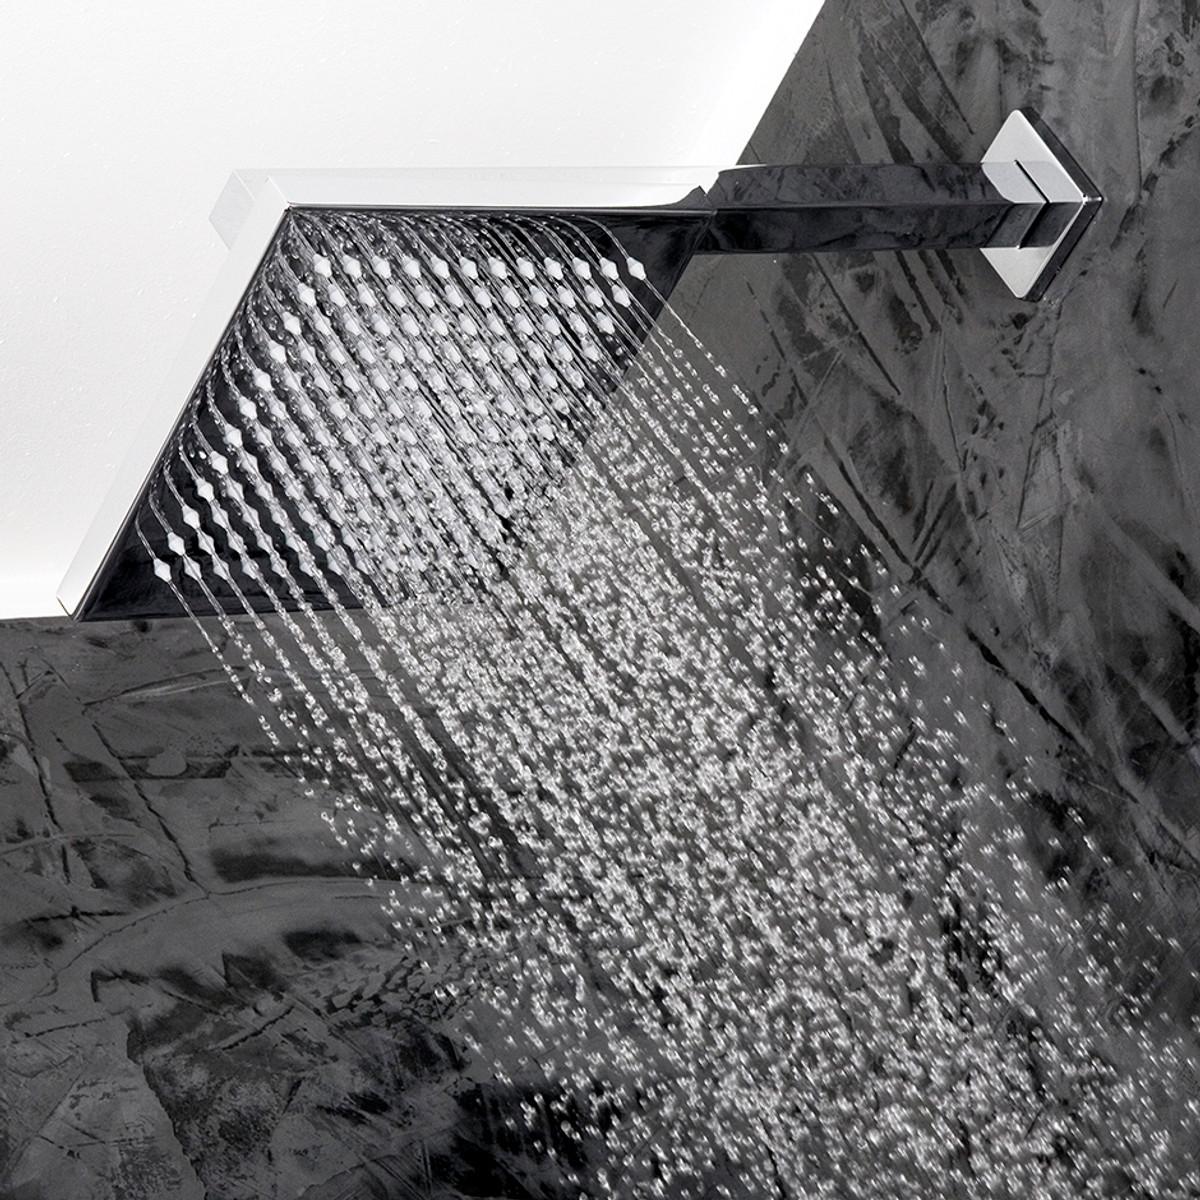 W1070 Waterblade Showerhead